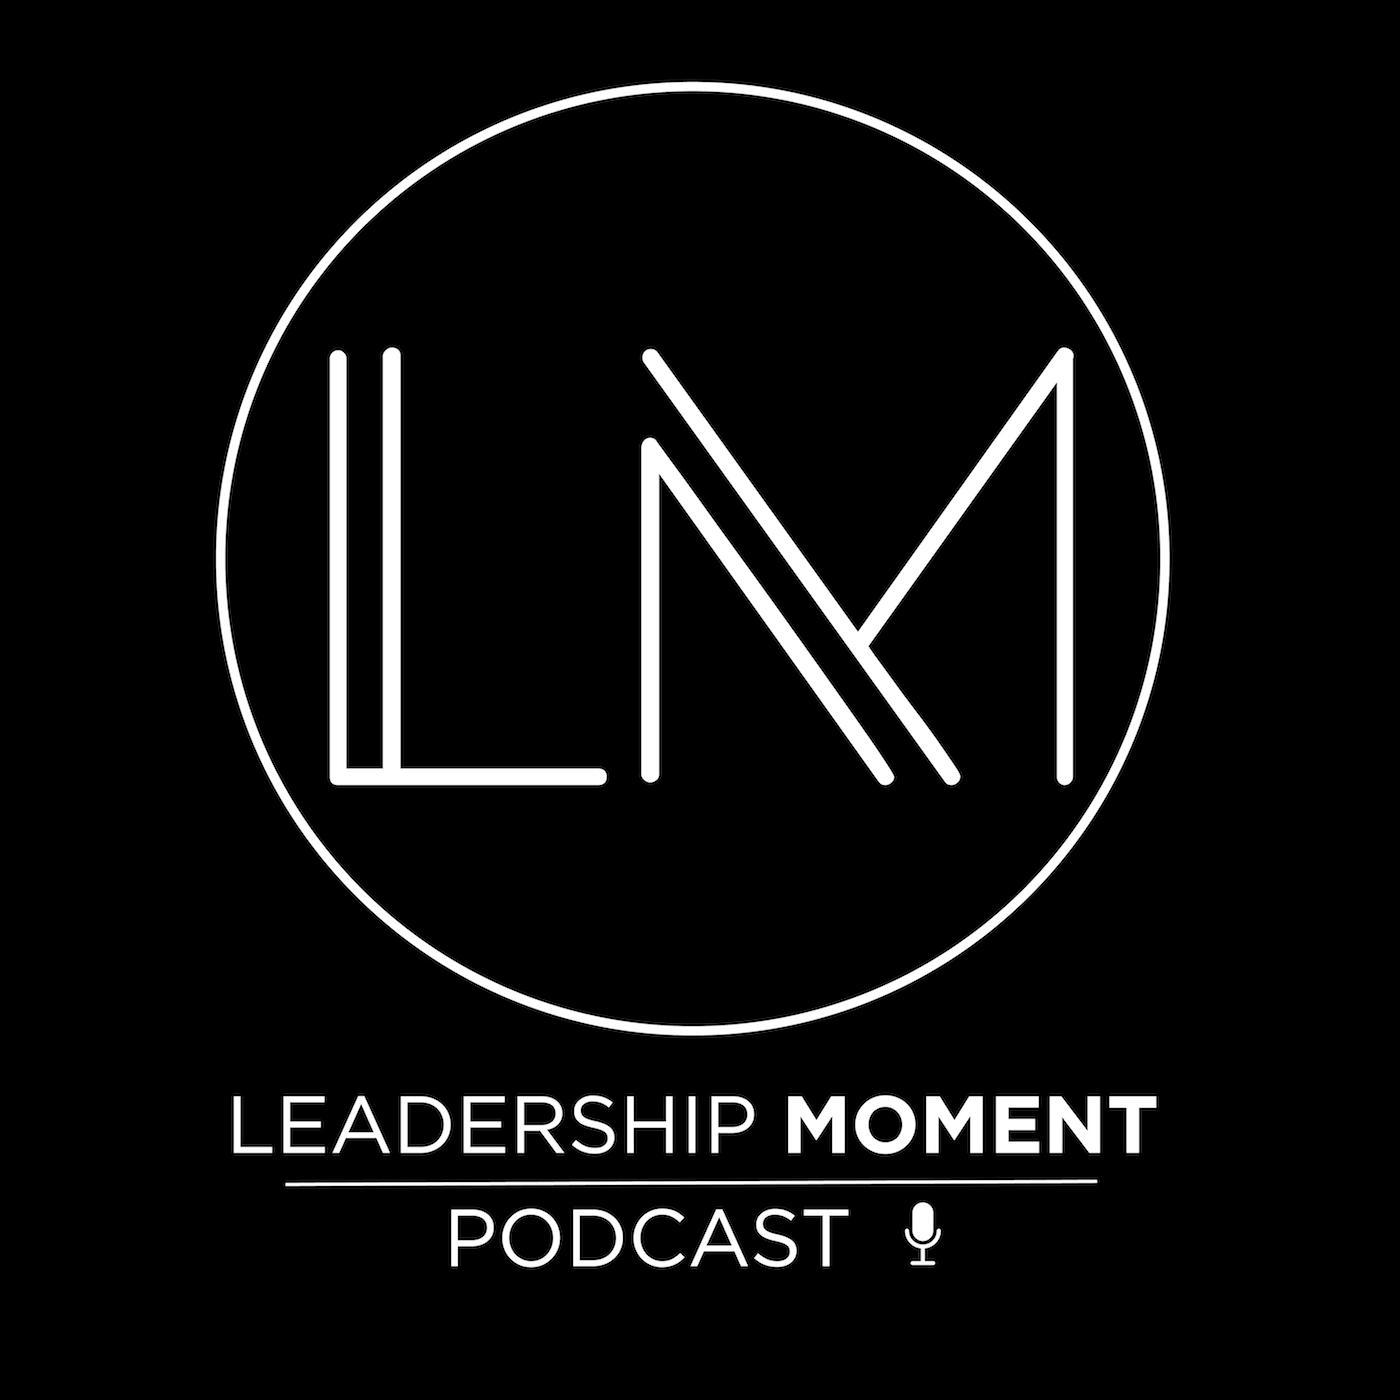 The True Reward of Leadership Development with Michael Pollard - LM0212